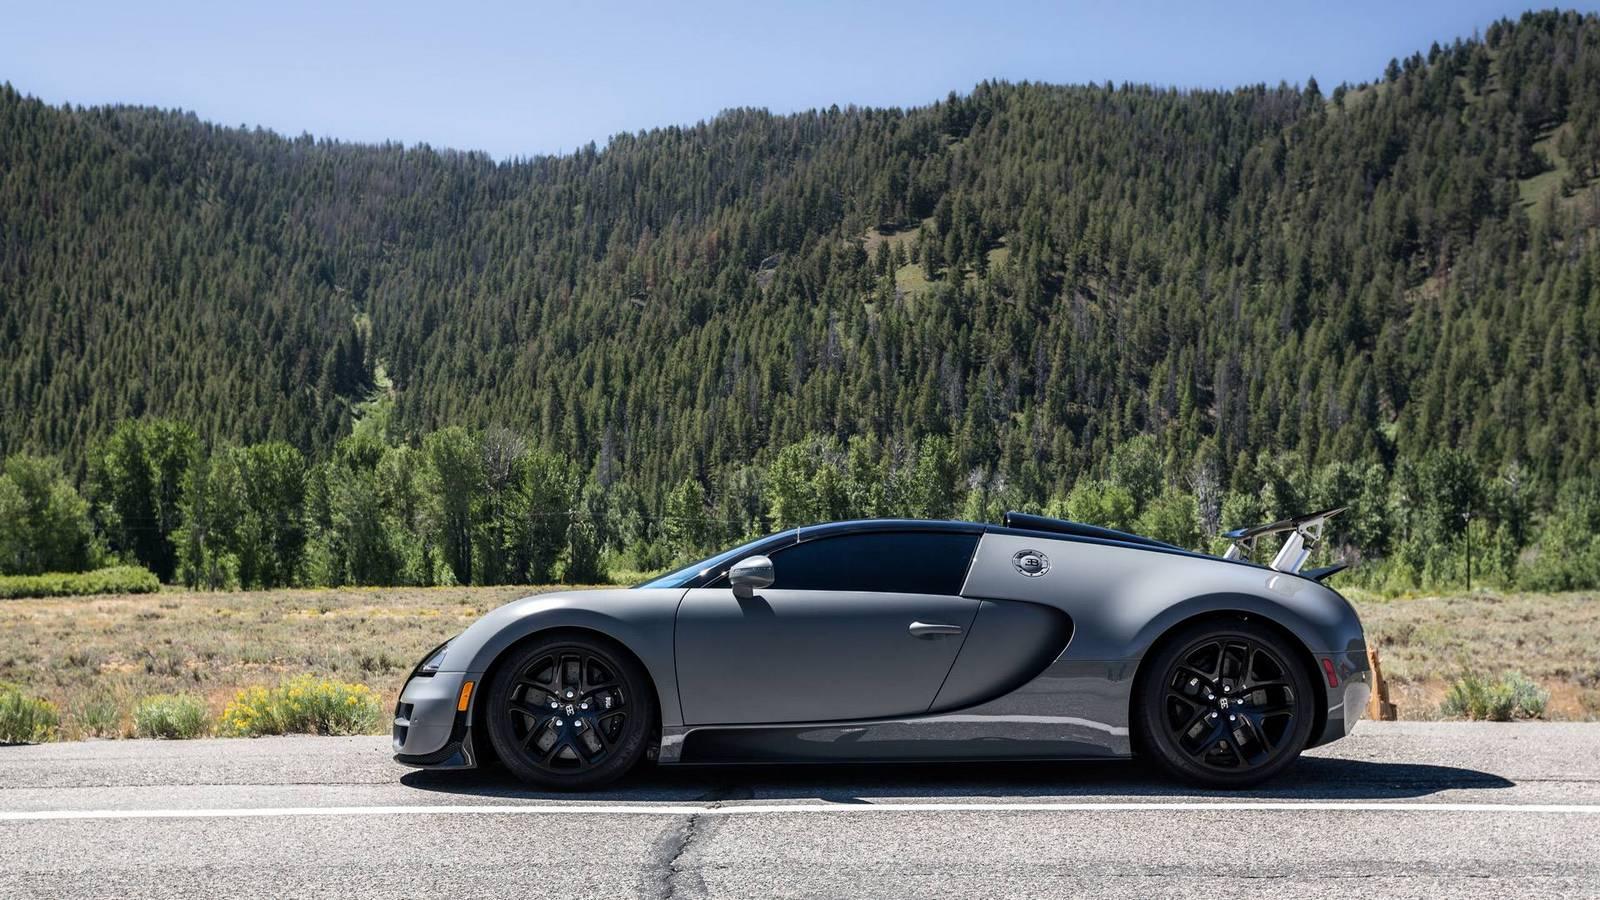 Фото | Графитовый Bugatti Veyron